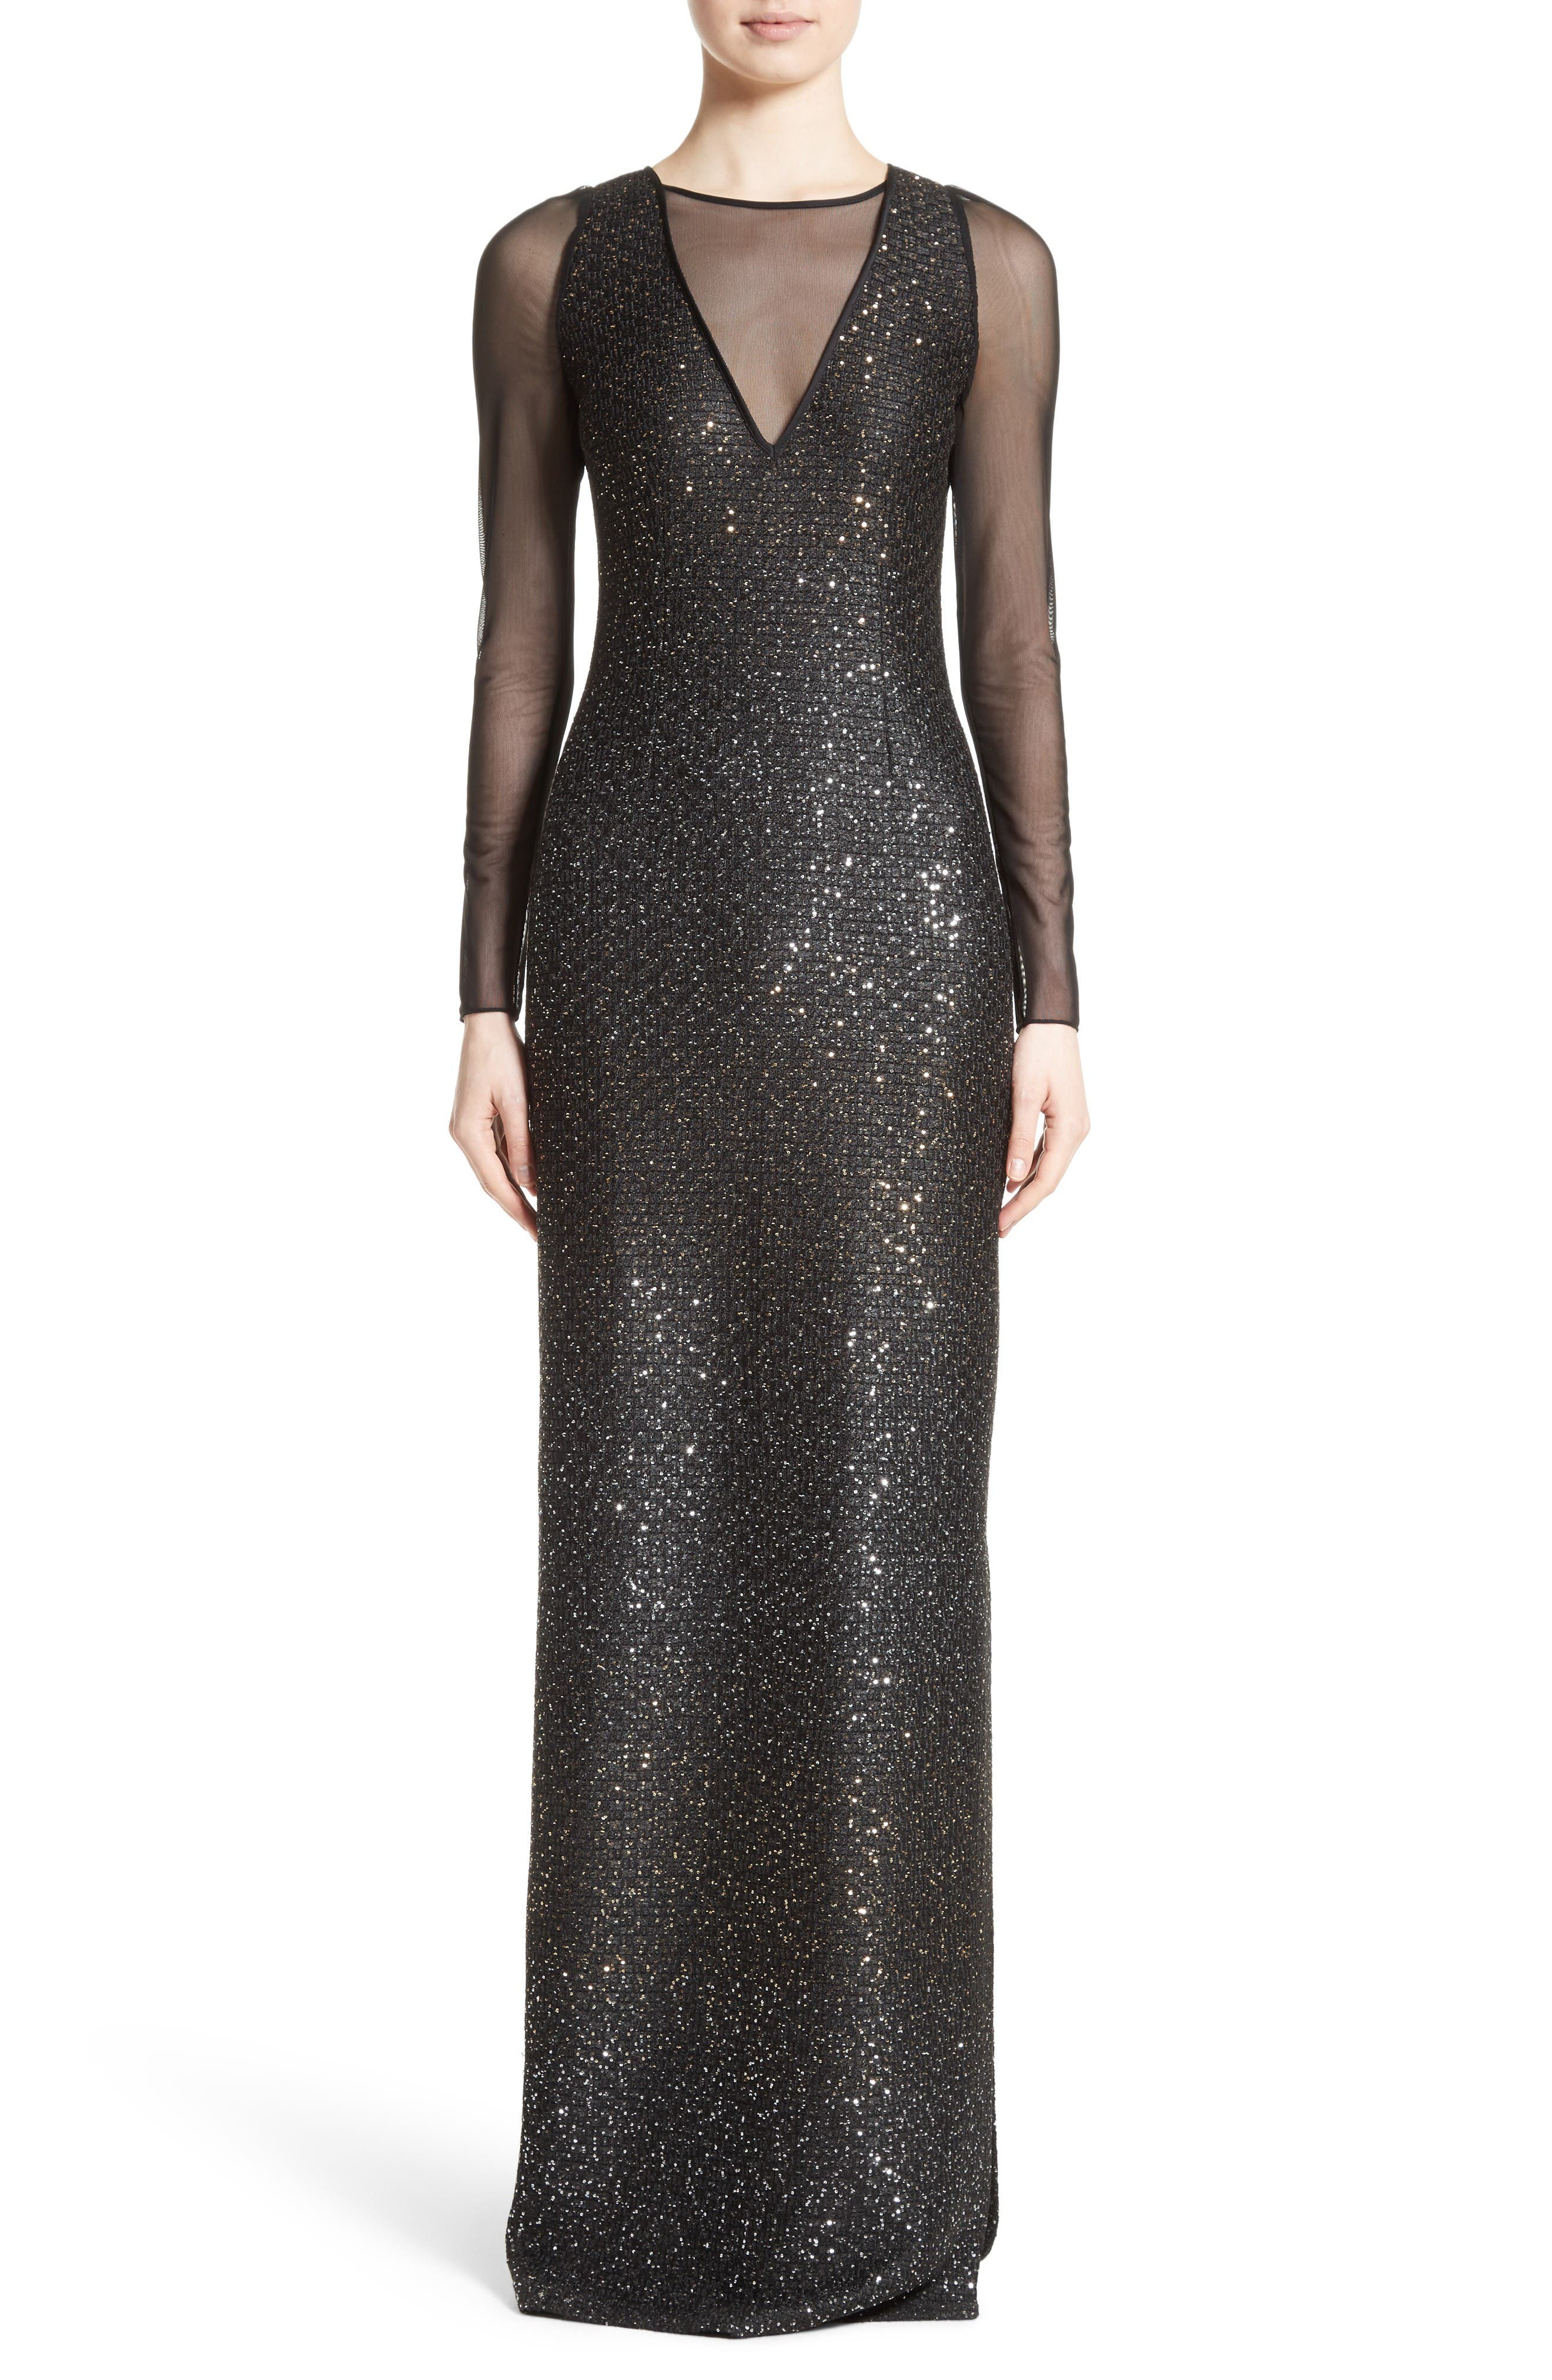 St. John Evening Sequin Illusion Yoke Gown